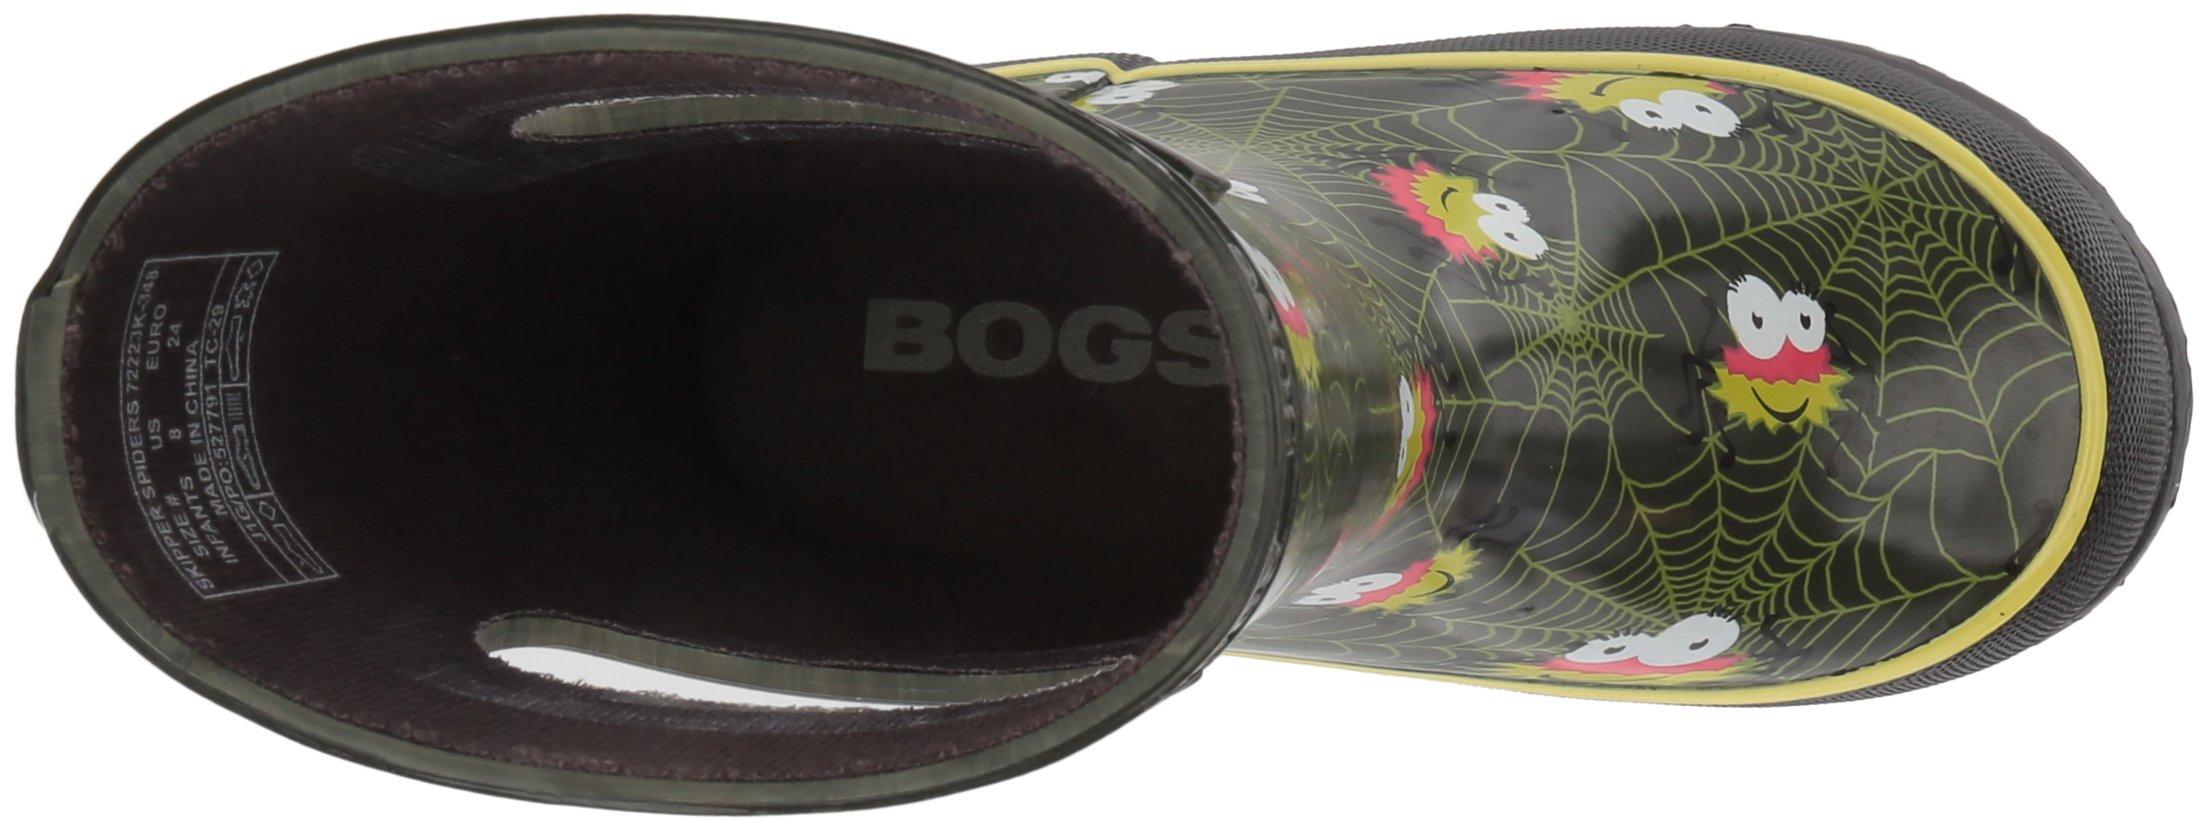 Bogs Kids' Skipper Waterproof Rubber Rain Boot for Boys and Girls,Smiley Spiders/Dark Green/Multi,11 M US Little Kid by Bogs (Image #8)